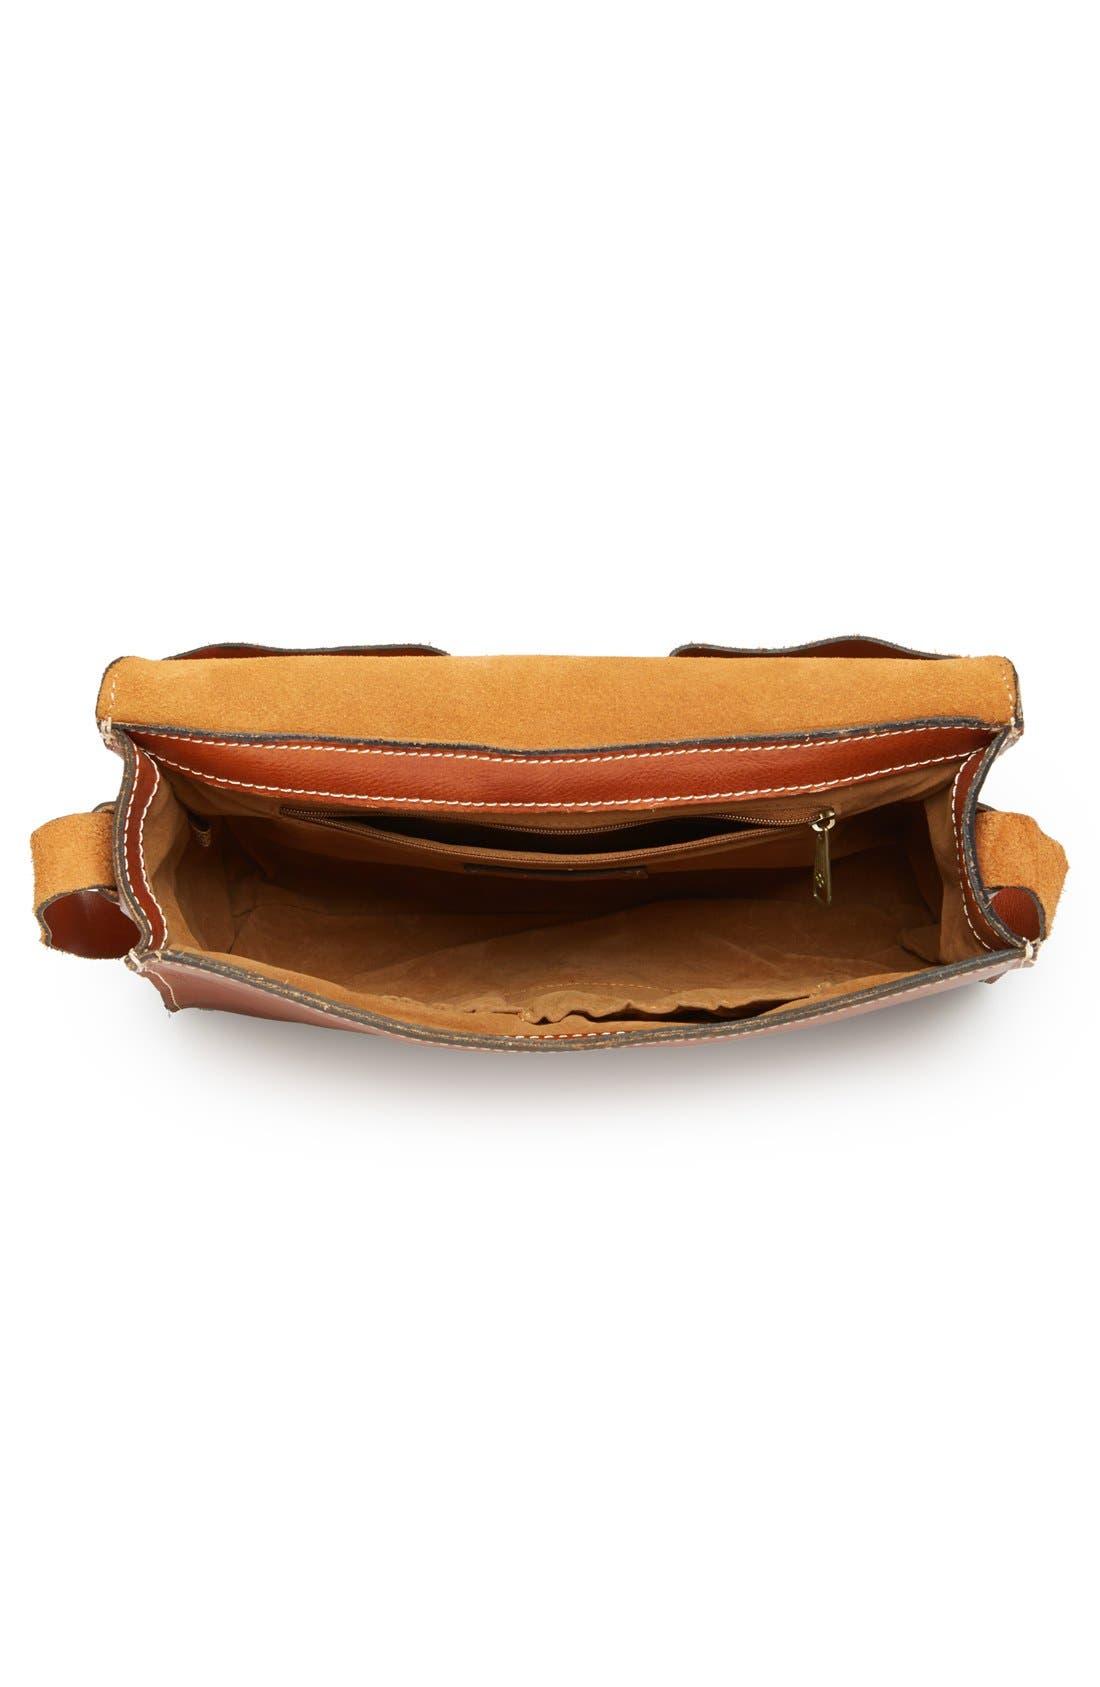 Alternate Image 3  - Patricia Nash 'Mantova' Leather Crossbody Bag